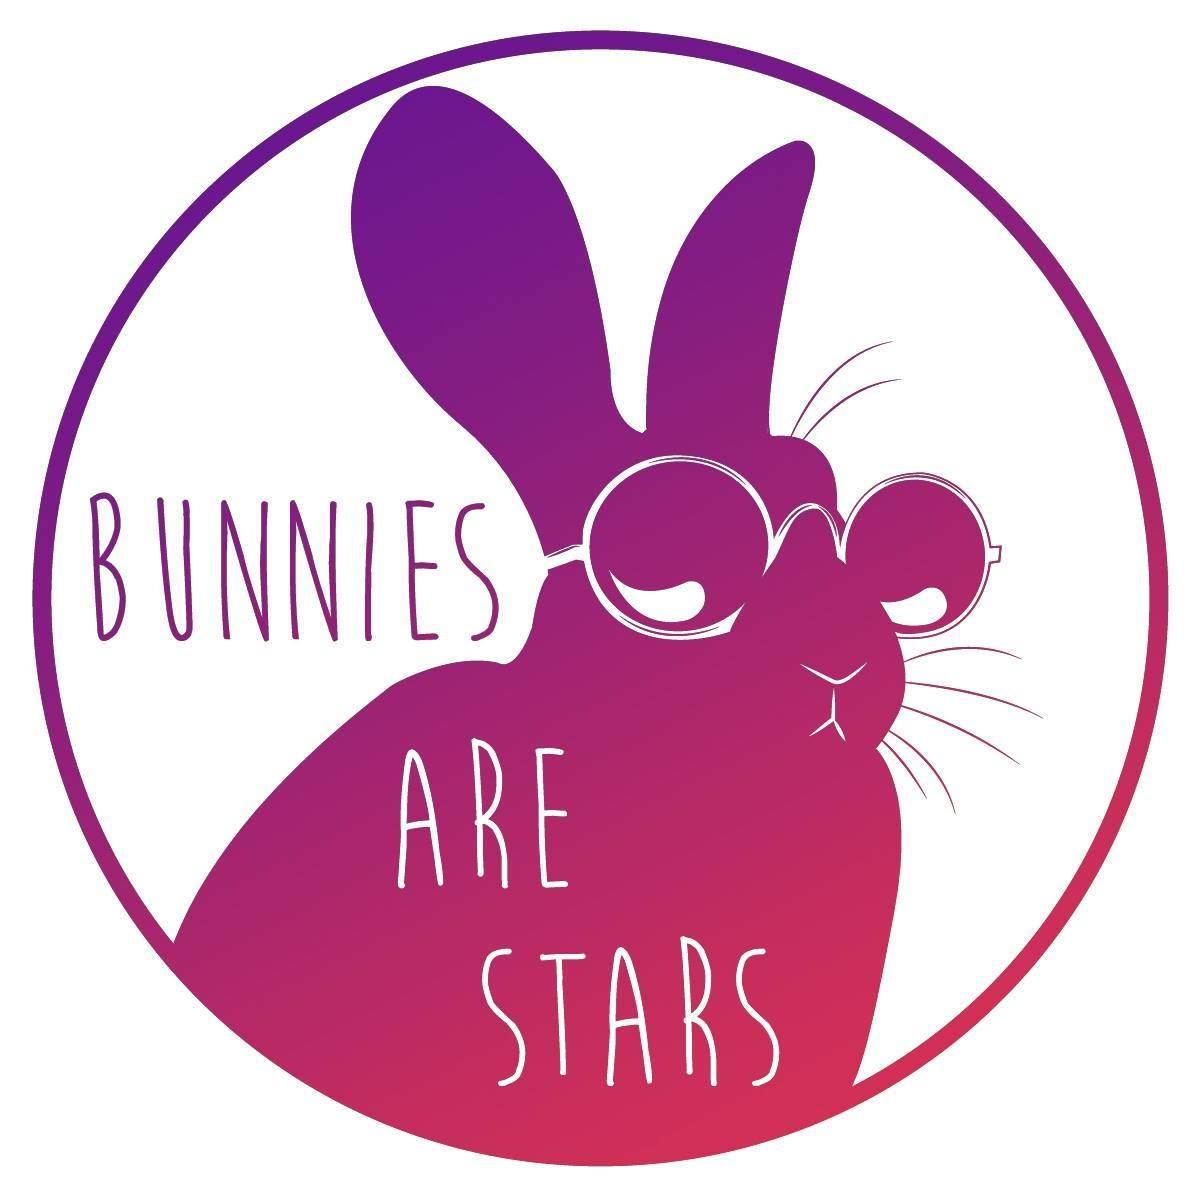 Bunnies are stars